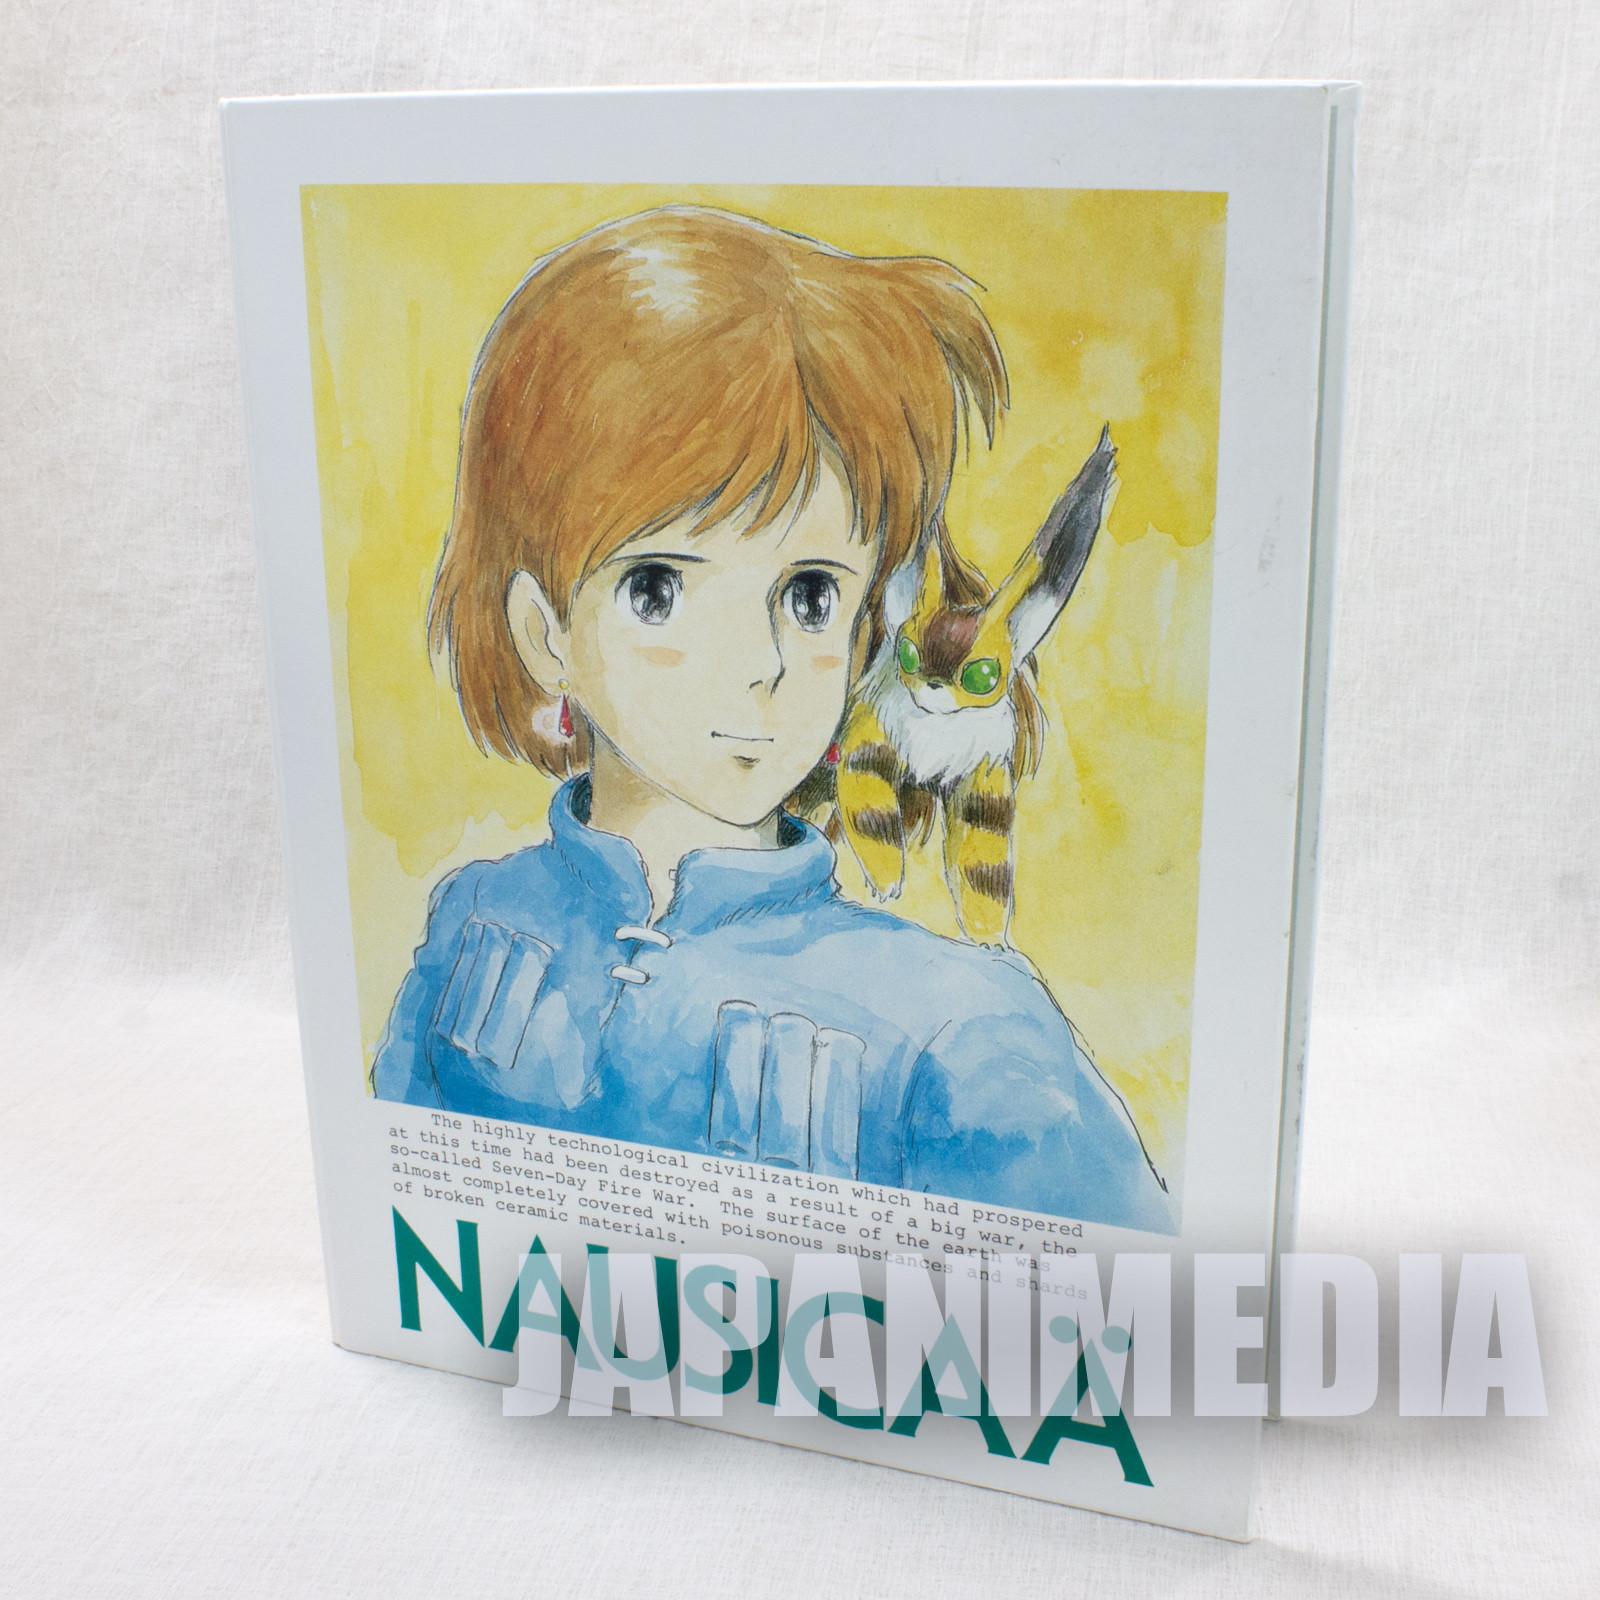 Retro RARE Nausicaa of the Valley Binder for B5 Loose-leaf Tokuma Shoten Ghibli